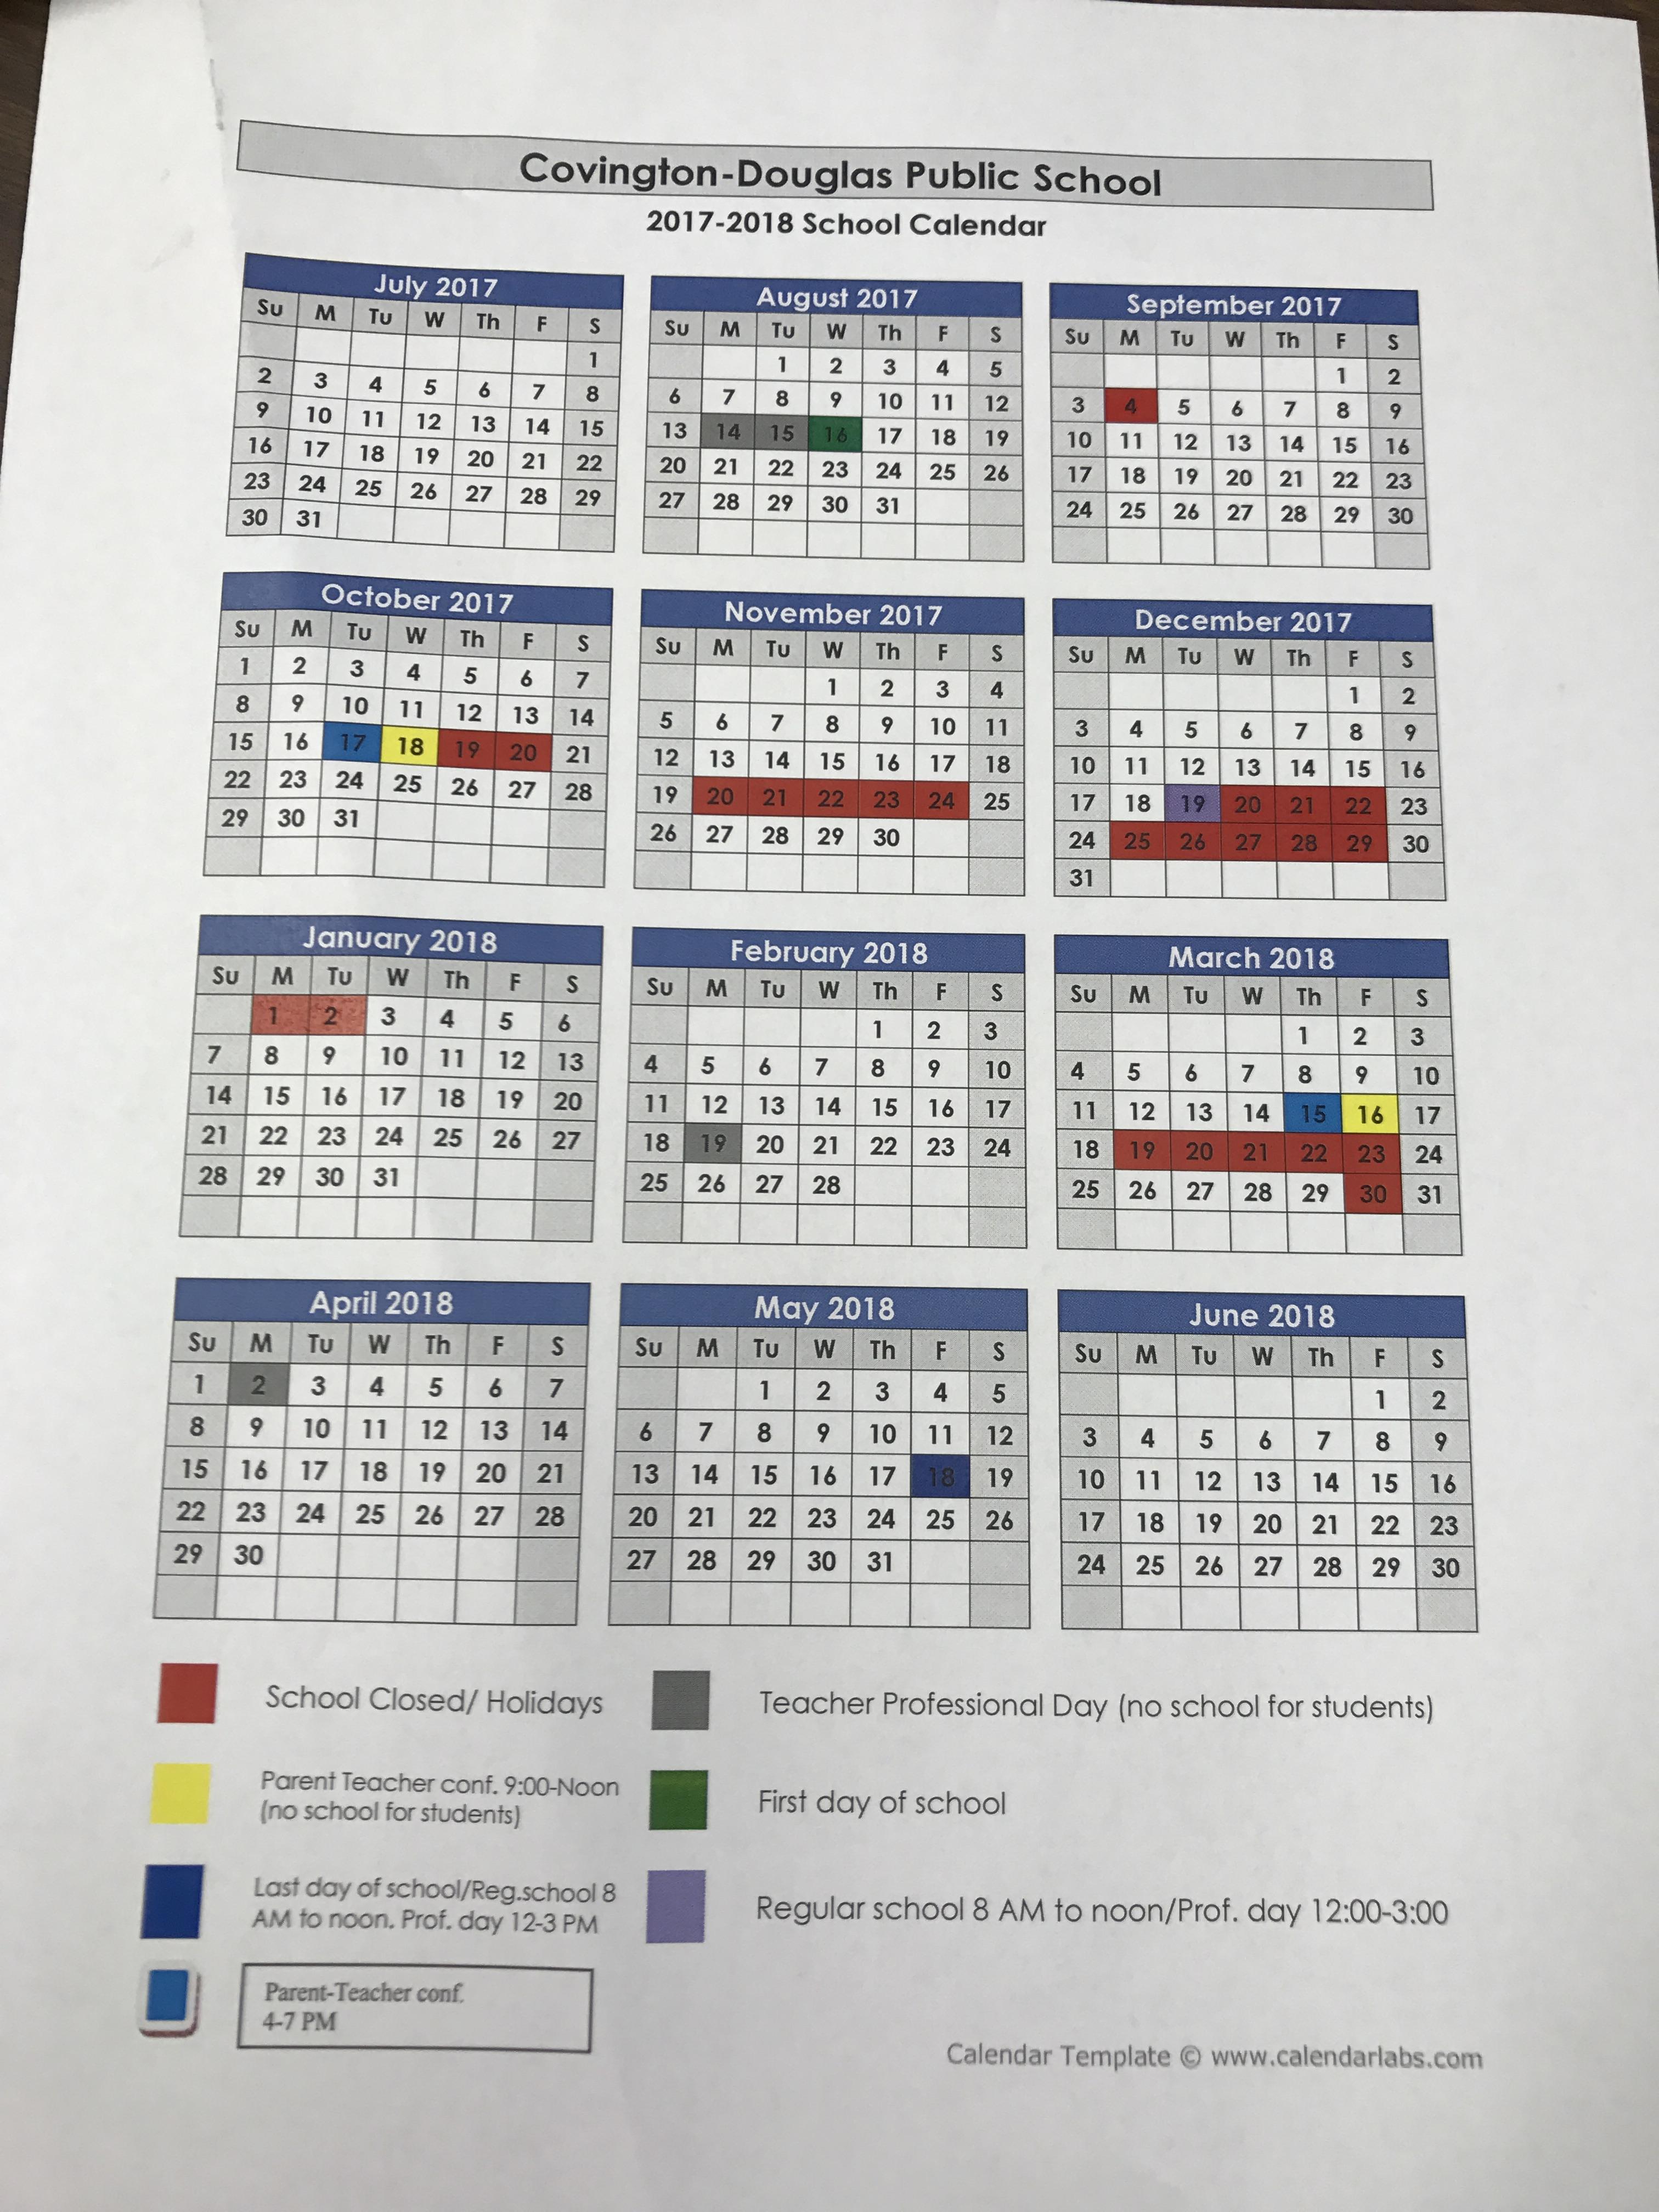 Covington-Douglas Public Schools - Yearly Calendar